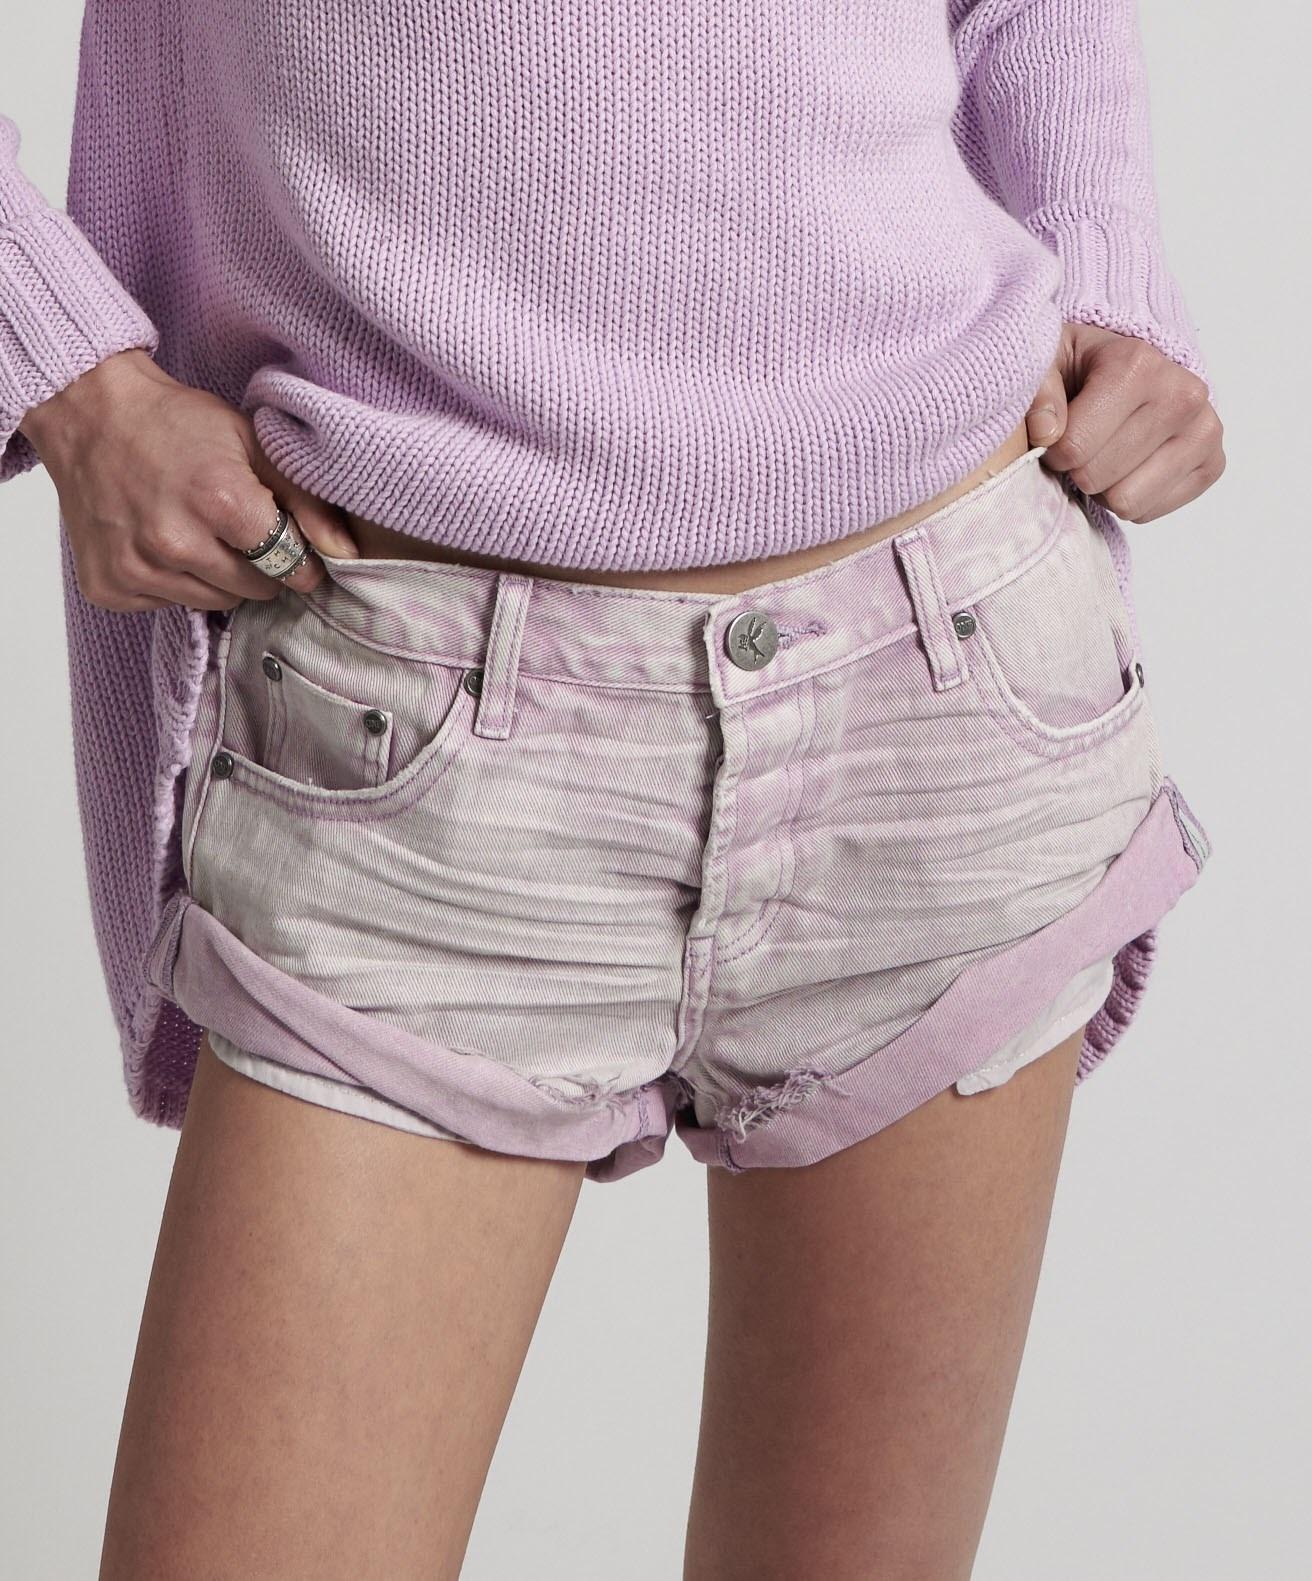 One Teaspoon Bandits Denim Shorts